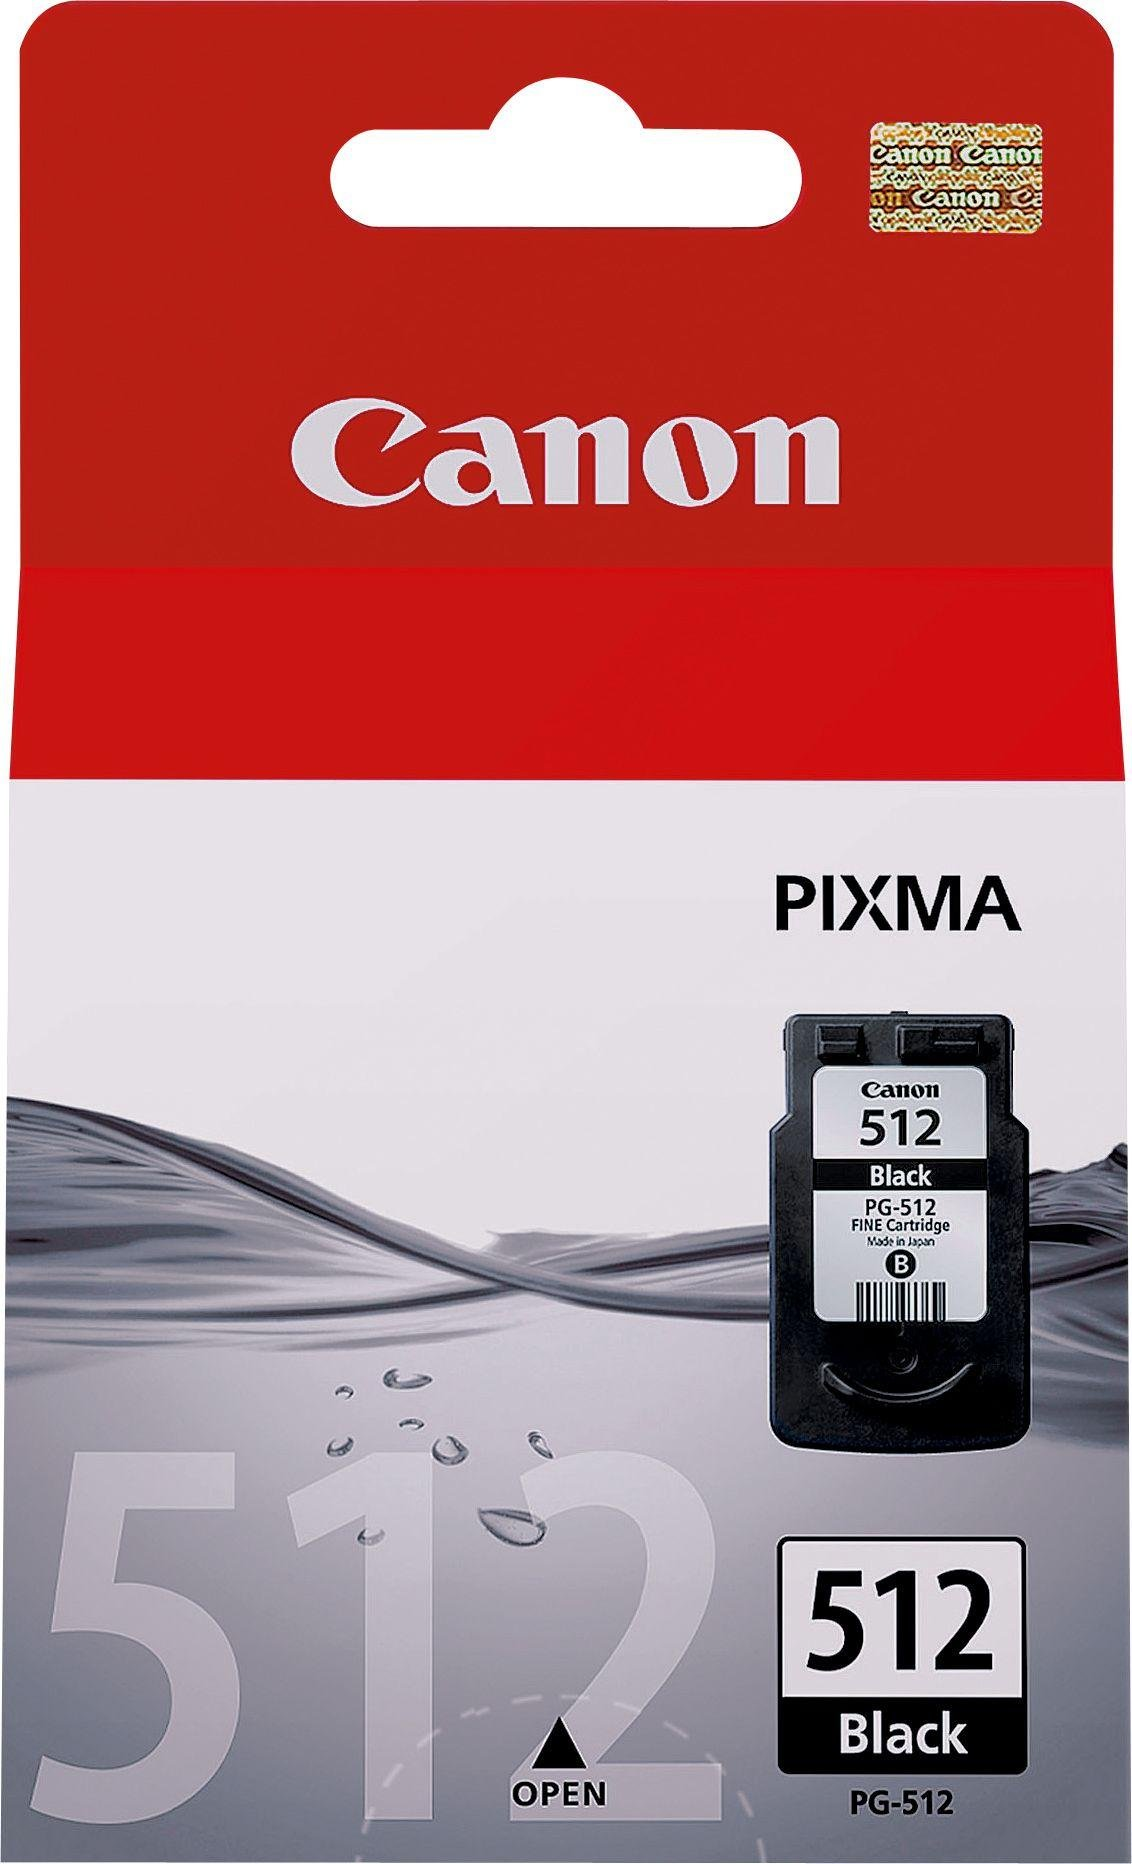 Canon PG-512 XL High Capacity Ink Cartridge - Black